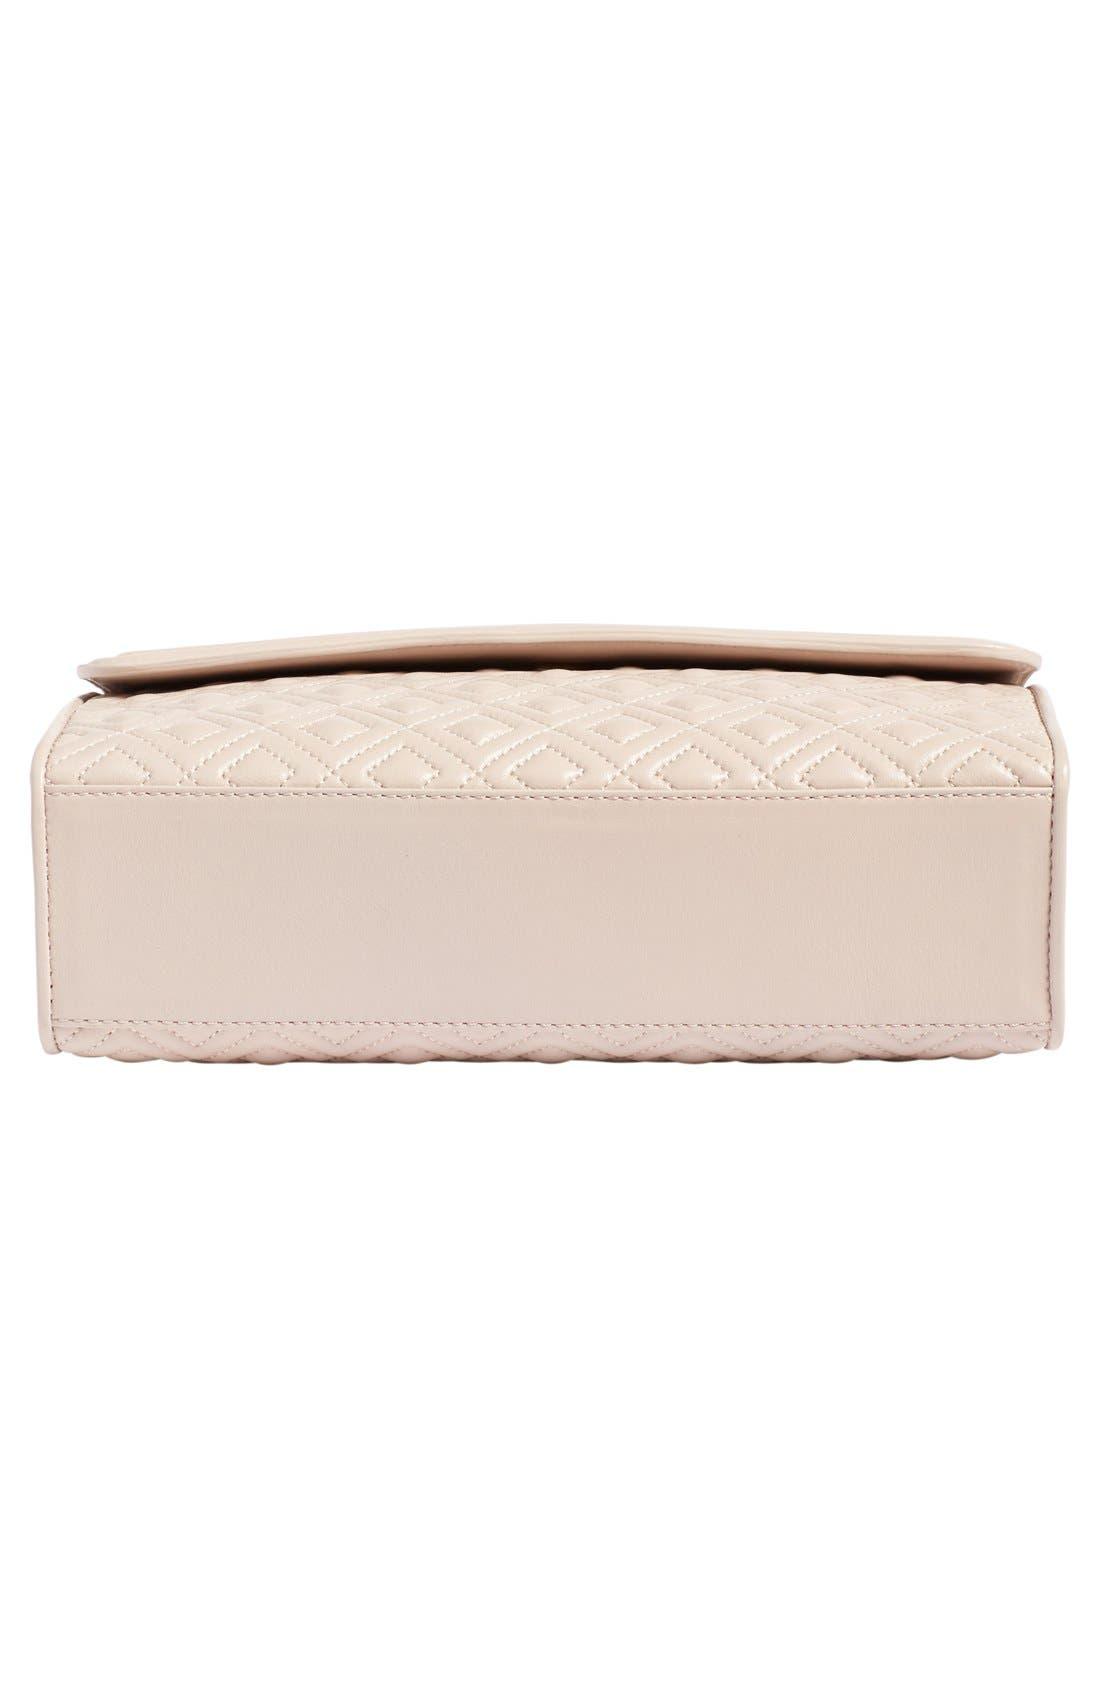 'Fleming' Convertible Shoulder Bag,                             Alternate thumbnail 6, color,                             262